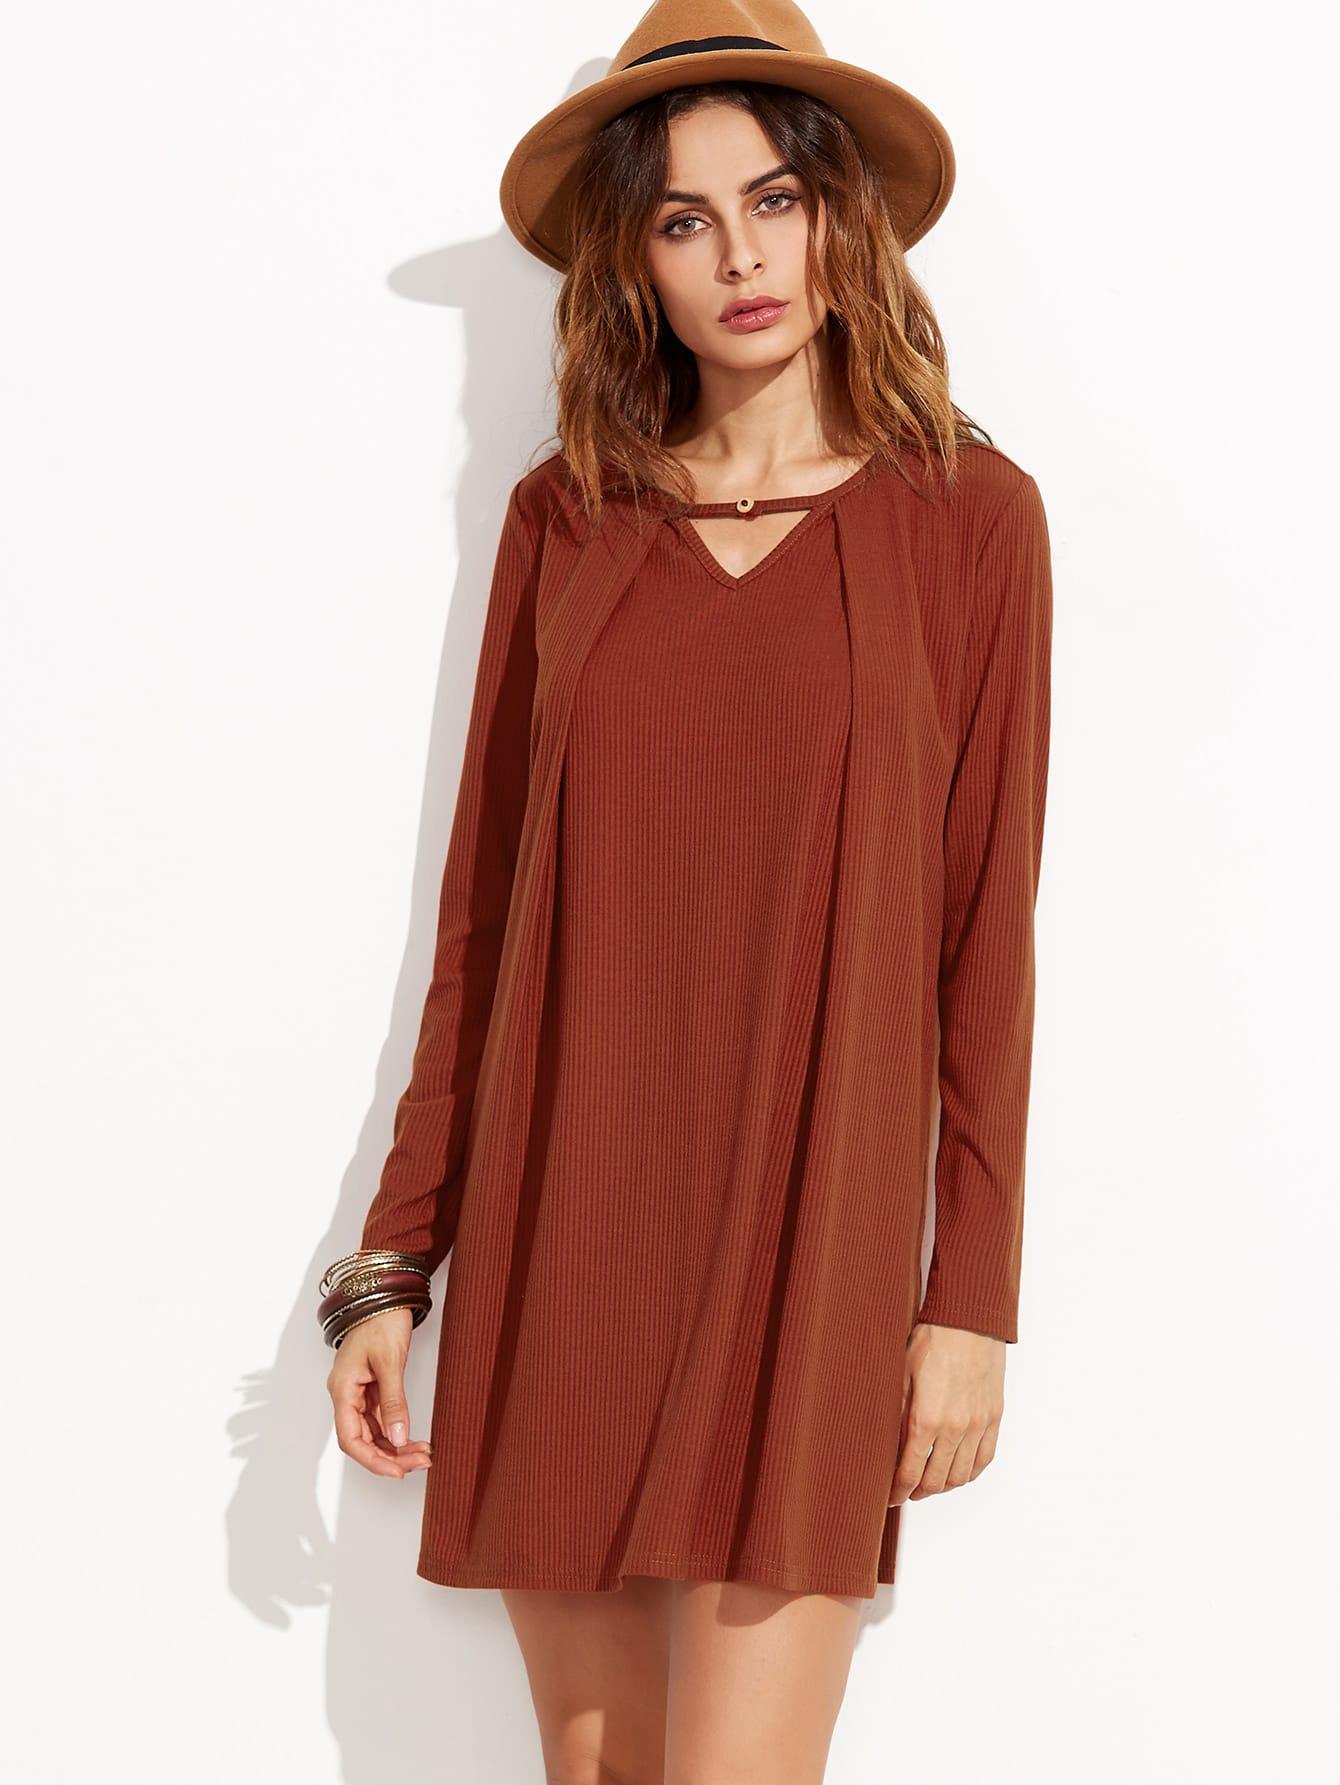 Burgundy Cutout V Neck Fold Over Ribbed Dress dress160901703